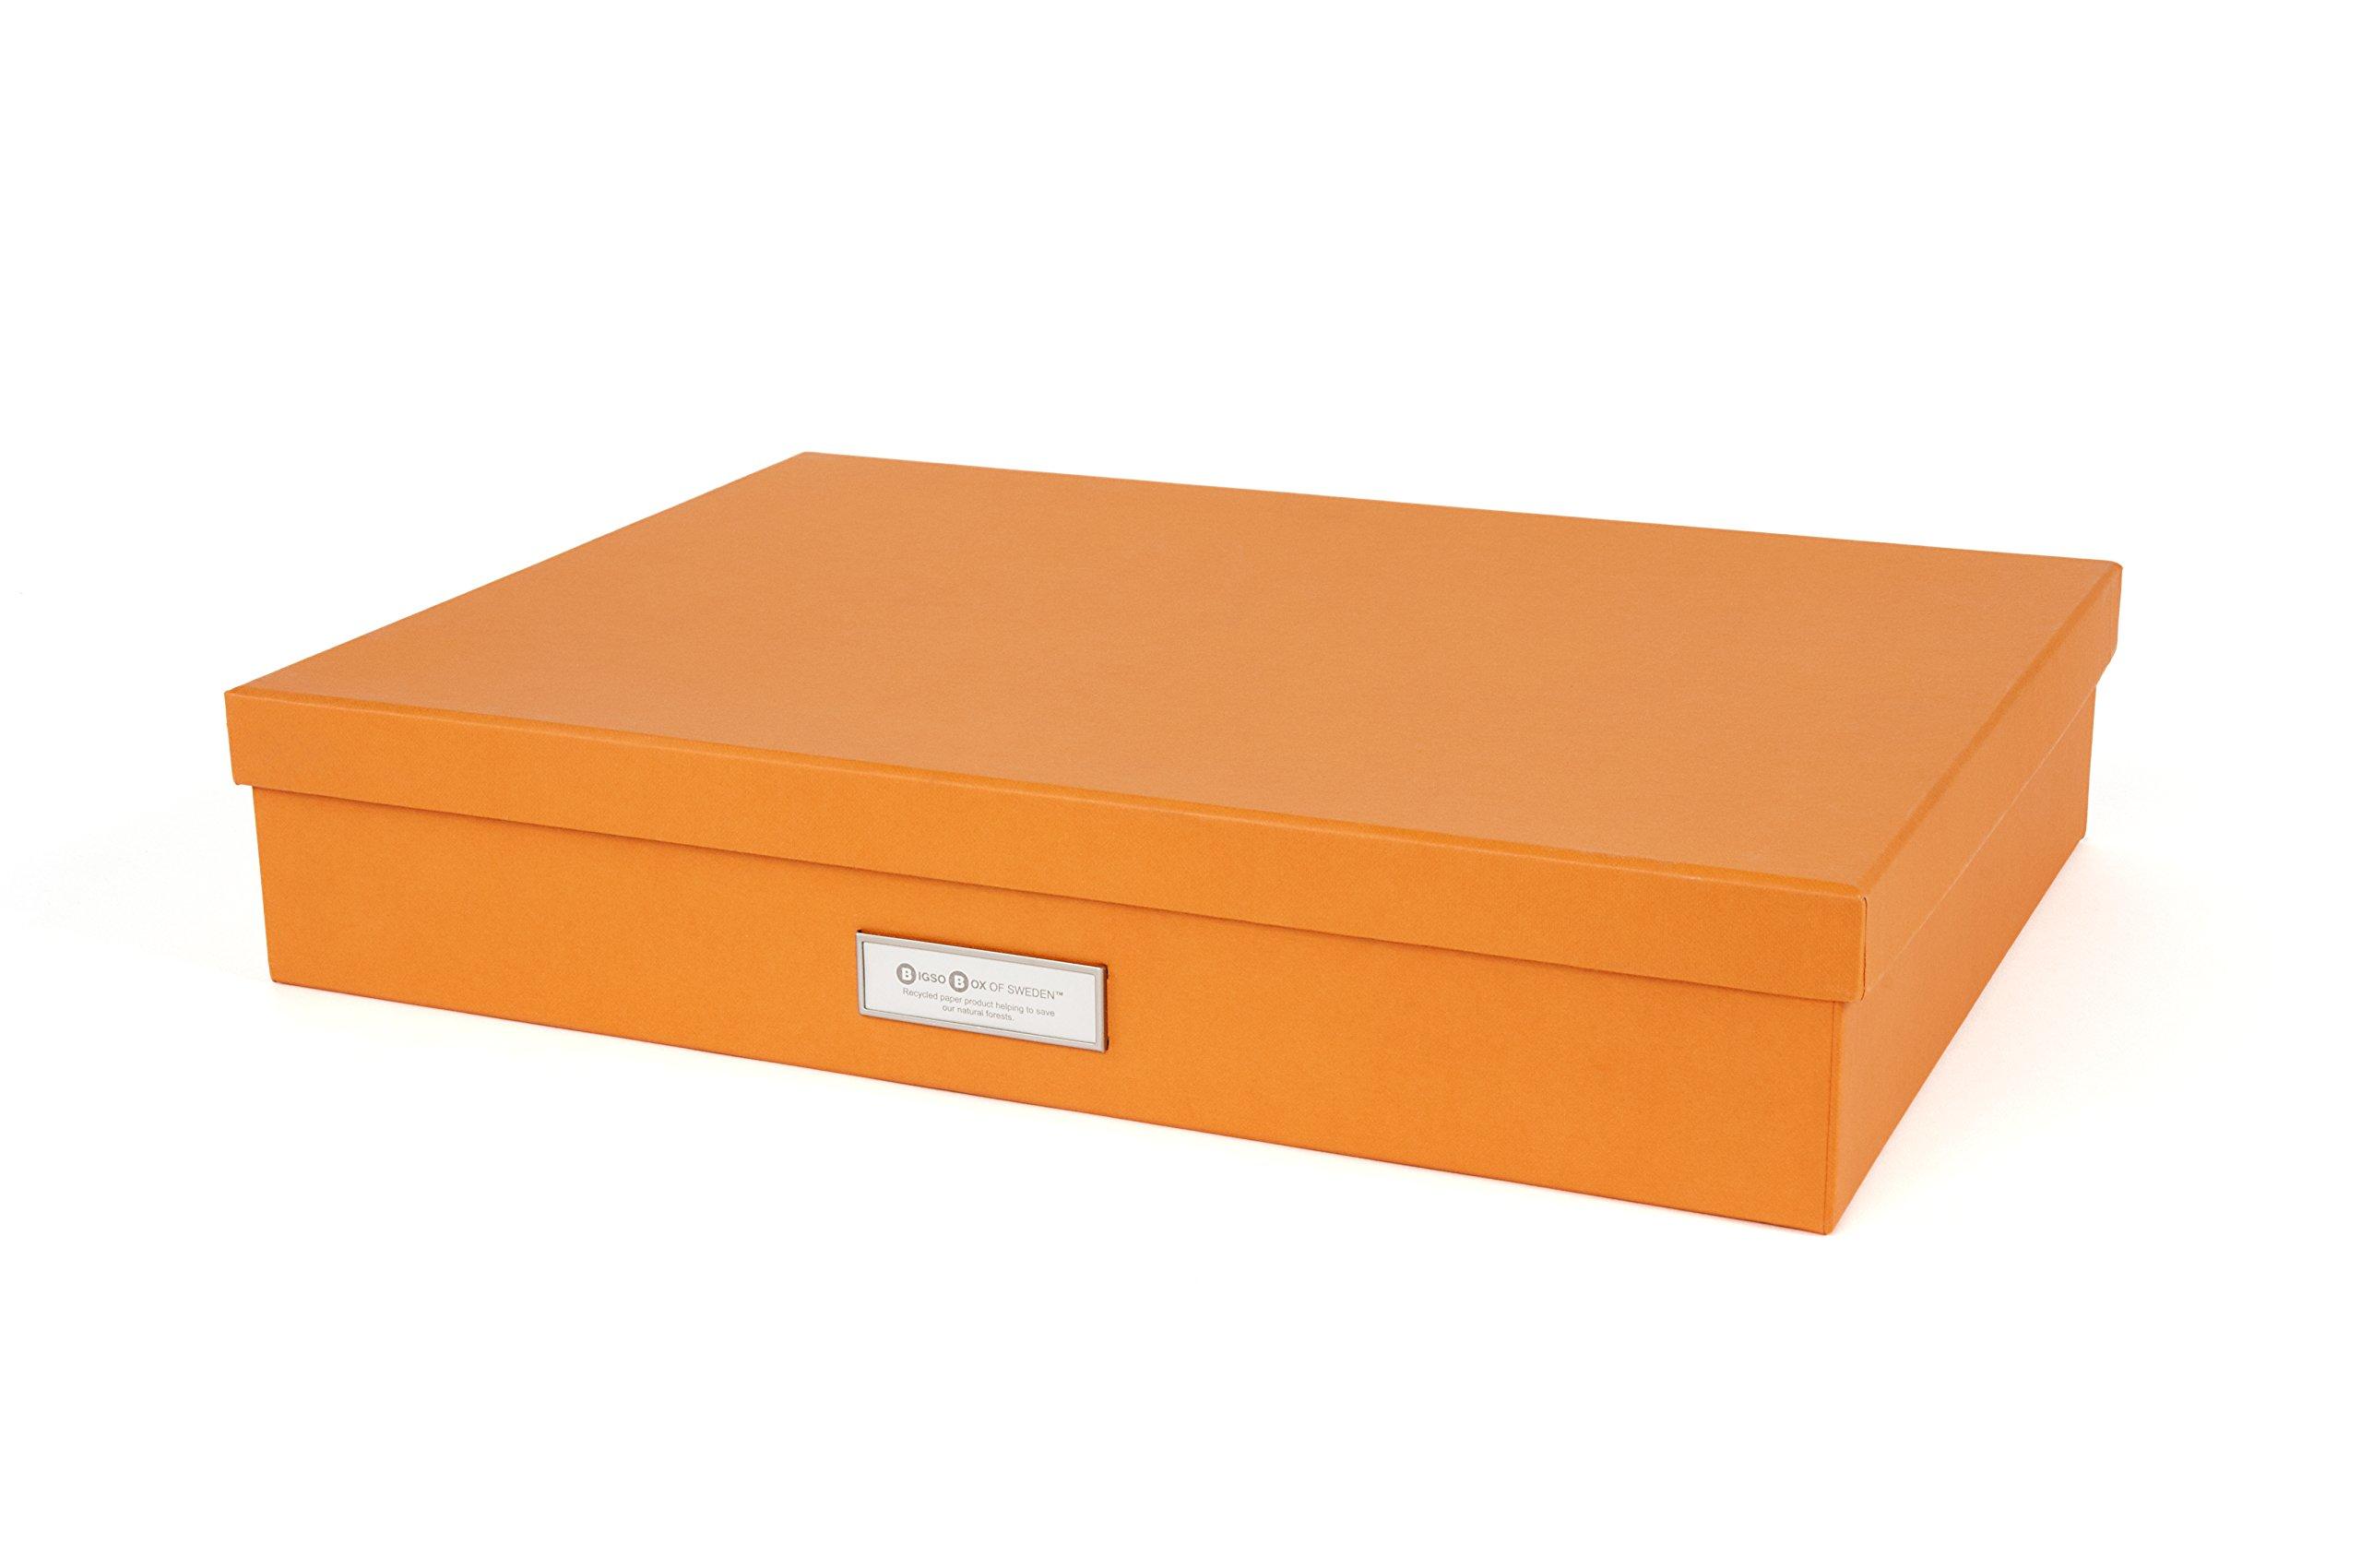 Bigso Sverker Document Storage Box, Orange by Bigso (Image #1)